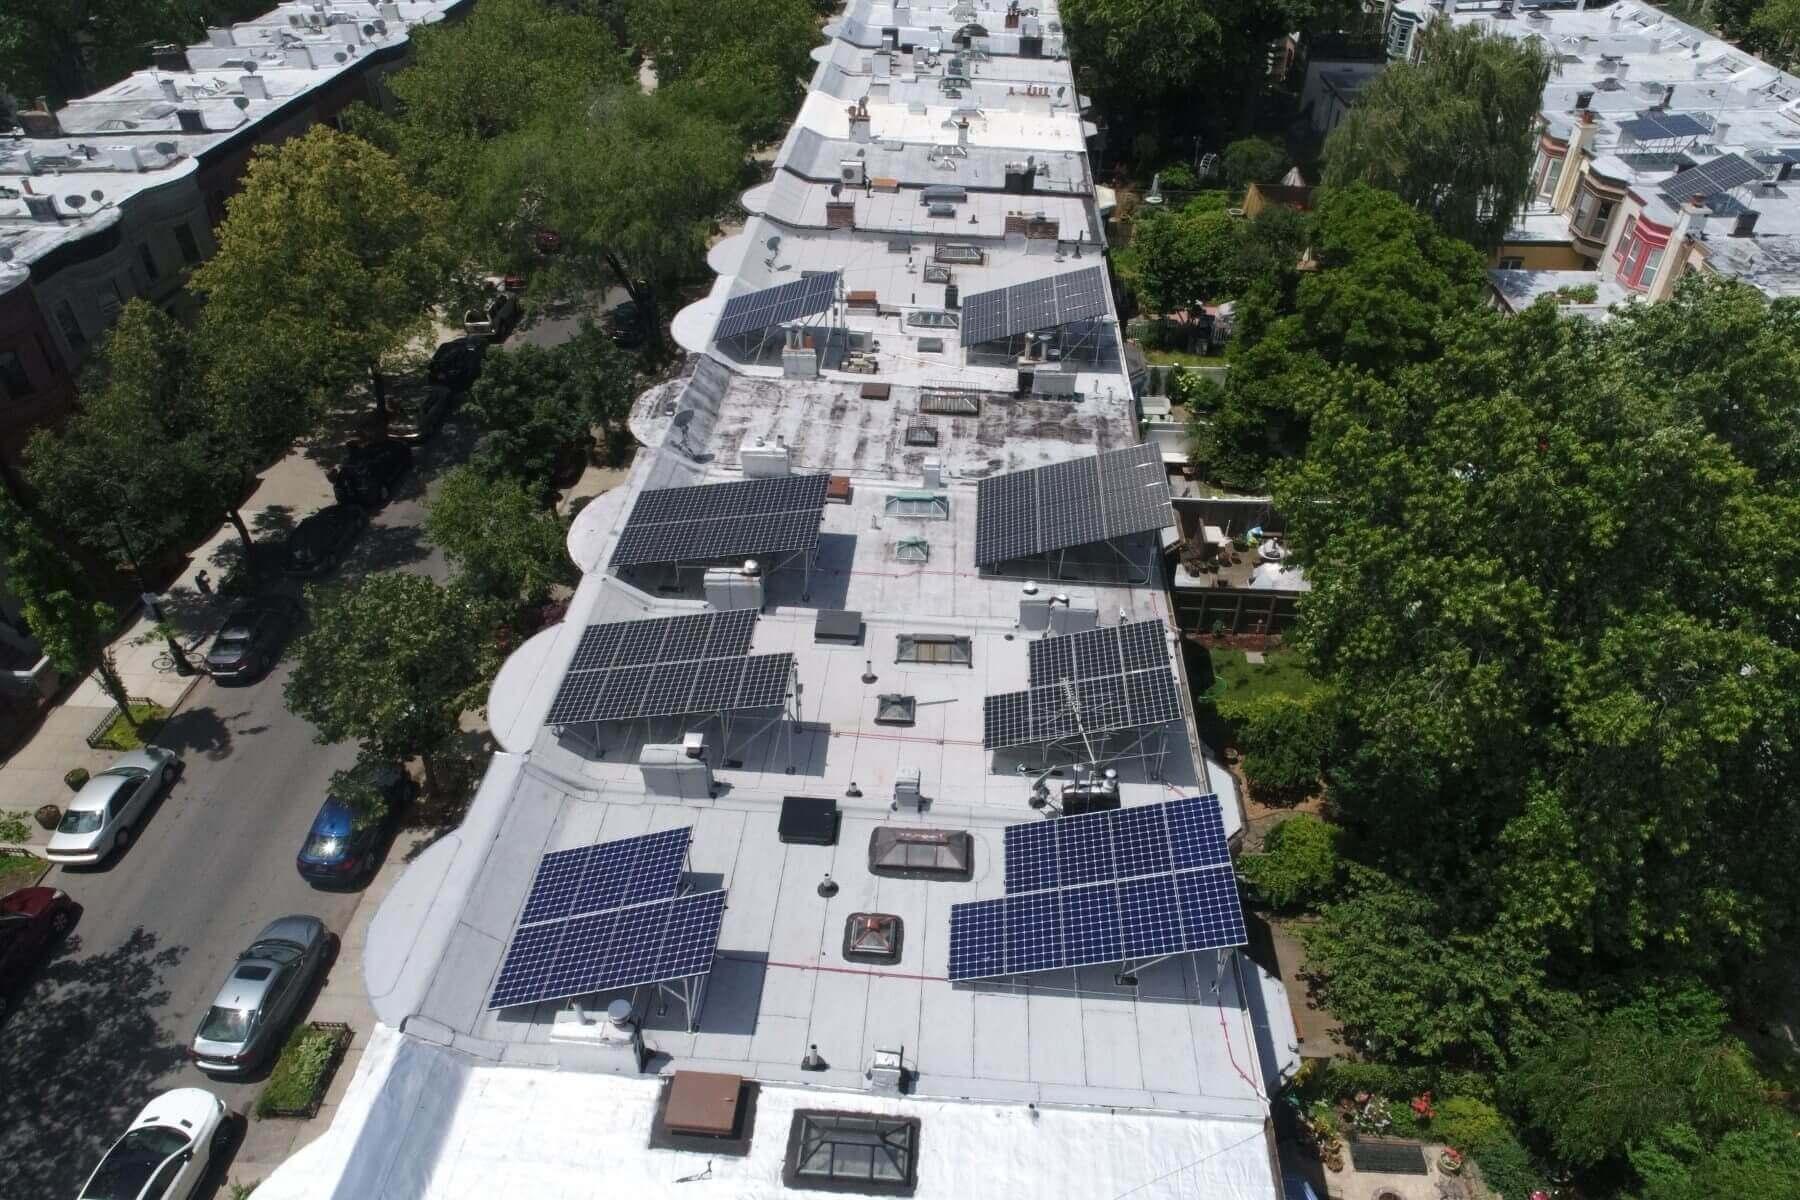 Solar systems installed on landmarked homes in Prospect Lefferts Gardens.